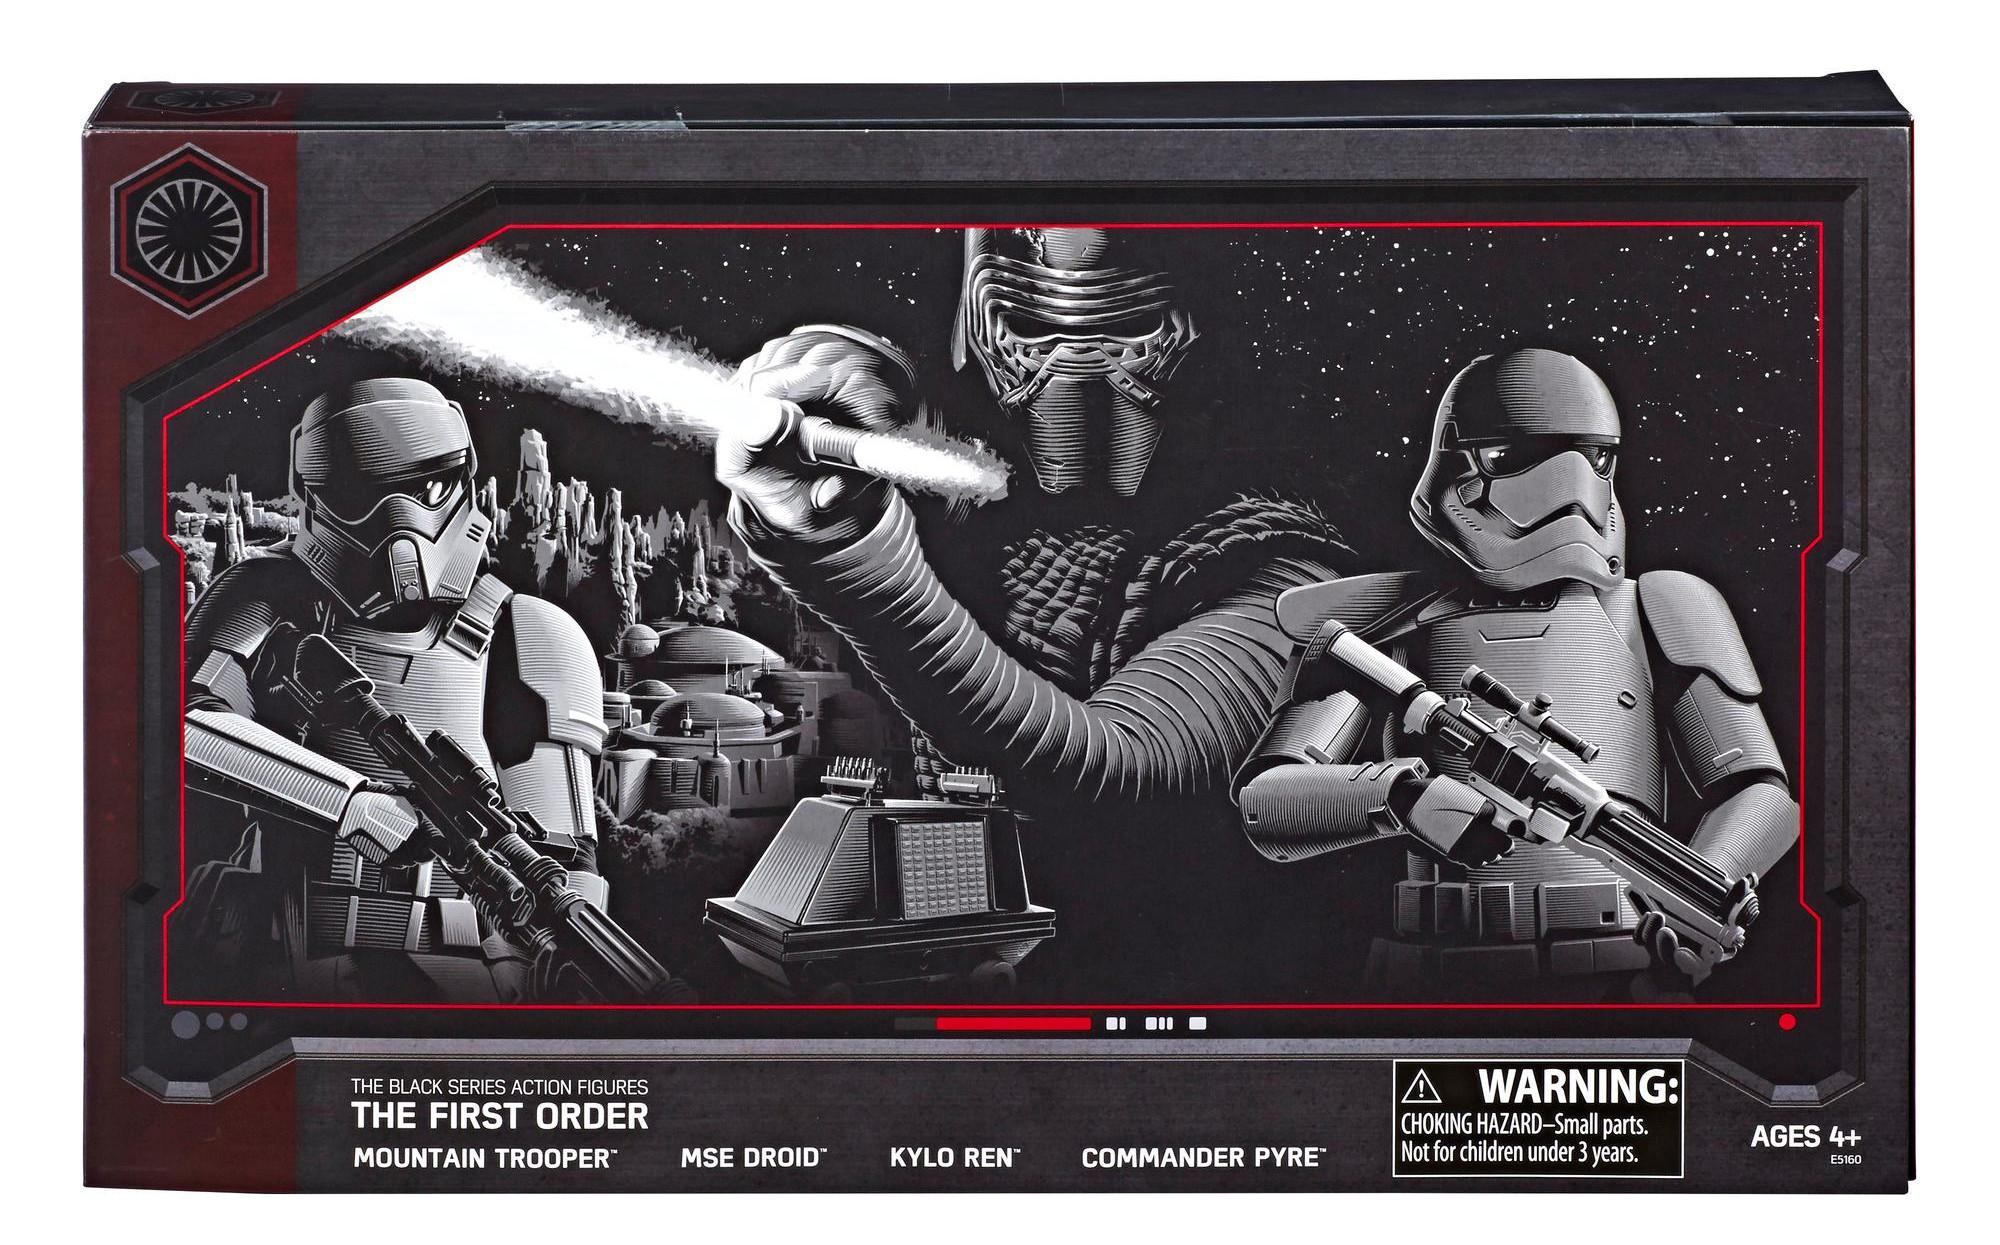 Hasbro Star Wars 2018 The Black Series 6 In action figure CAPTAIN environ 15.24 cm